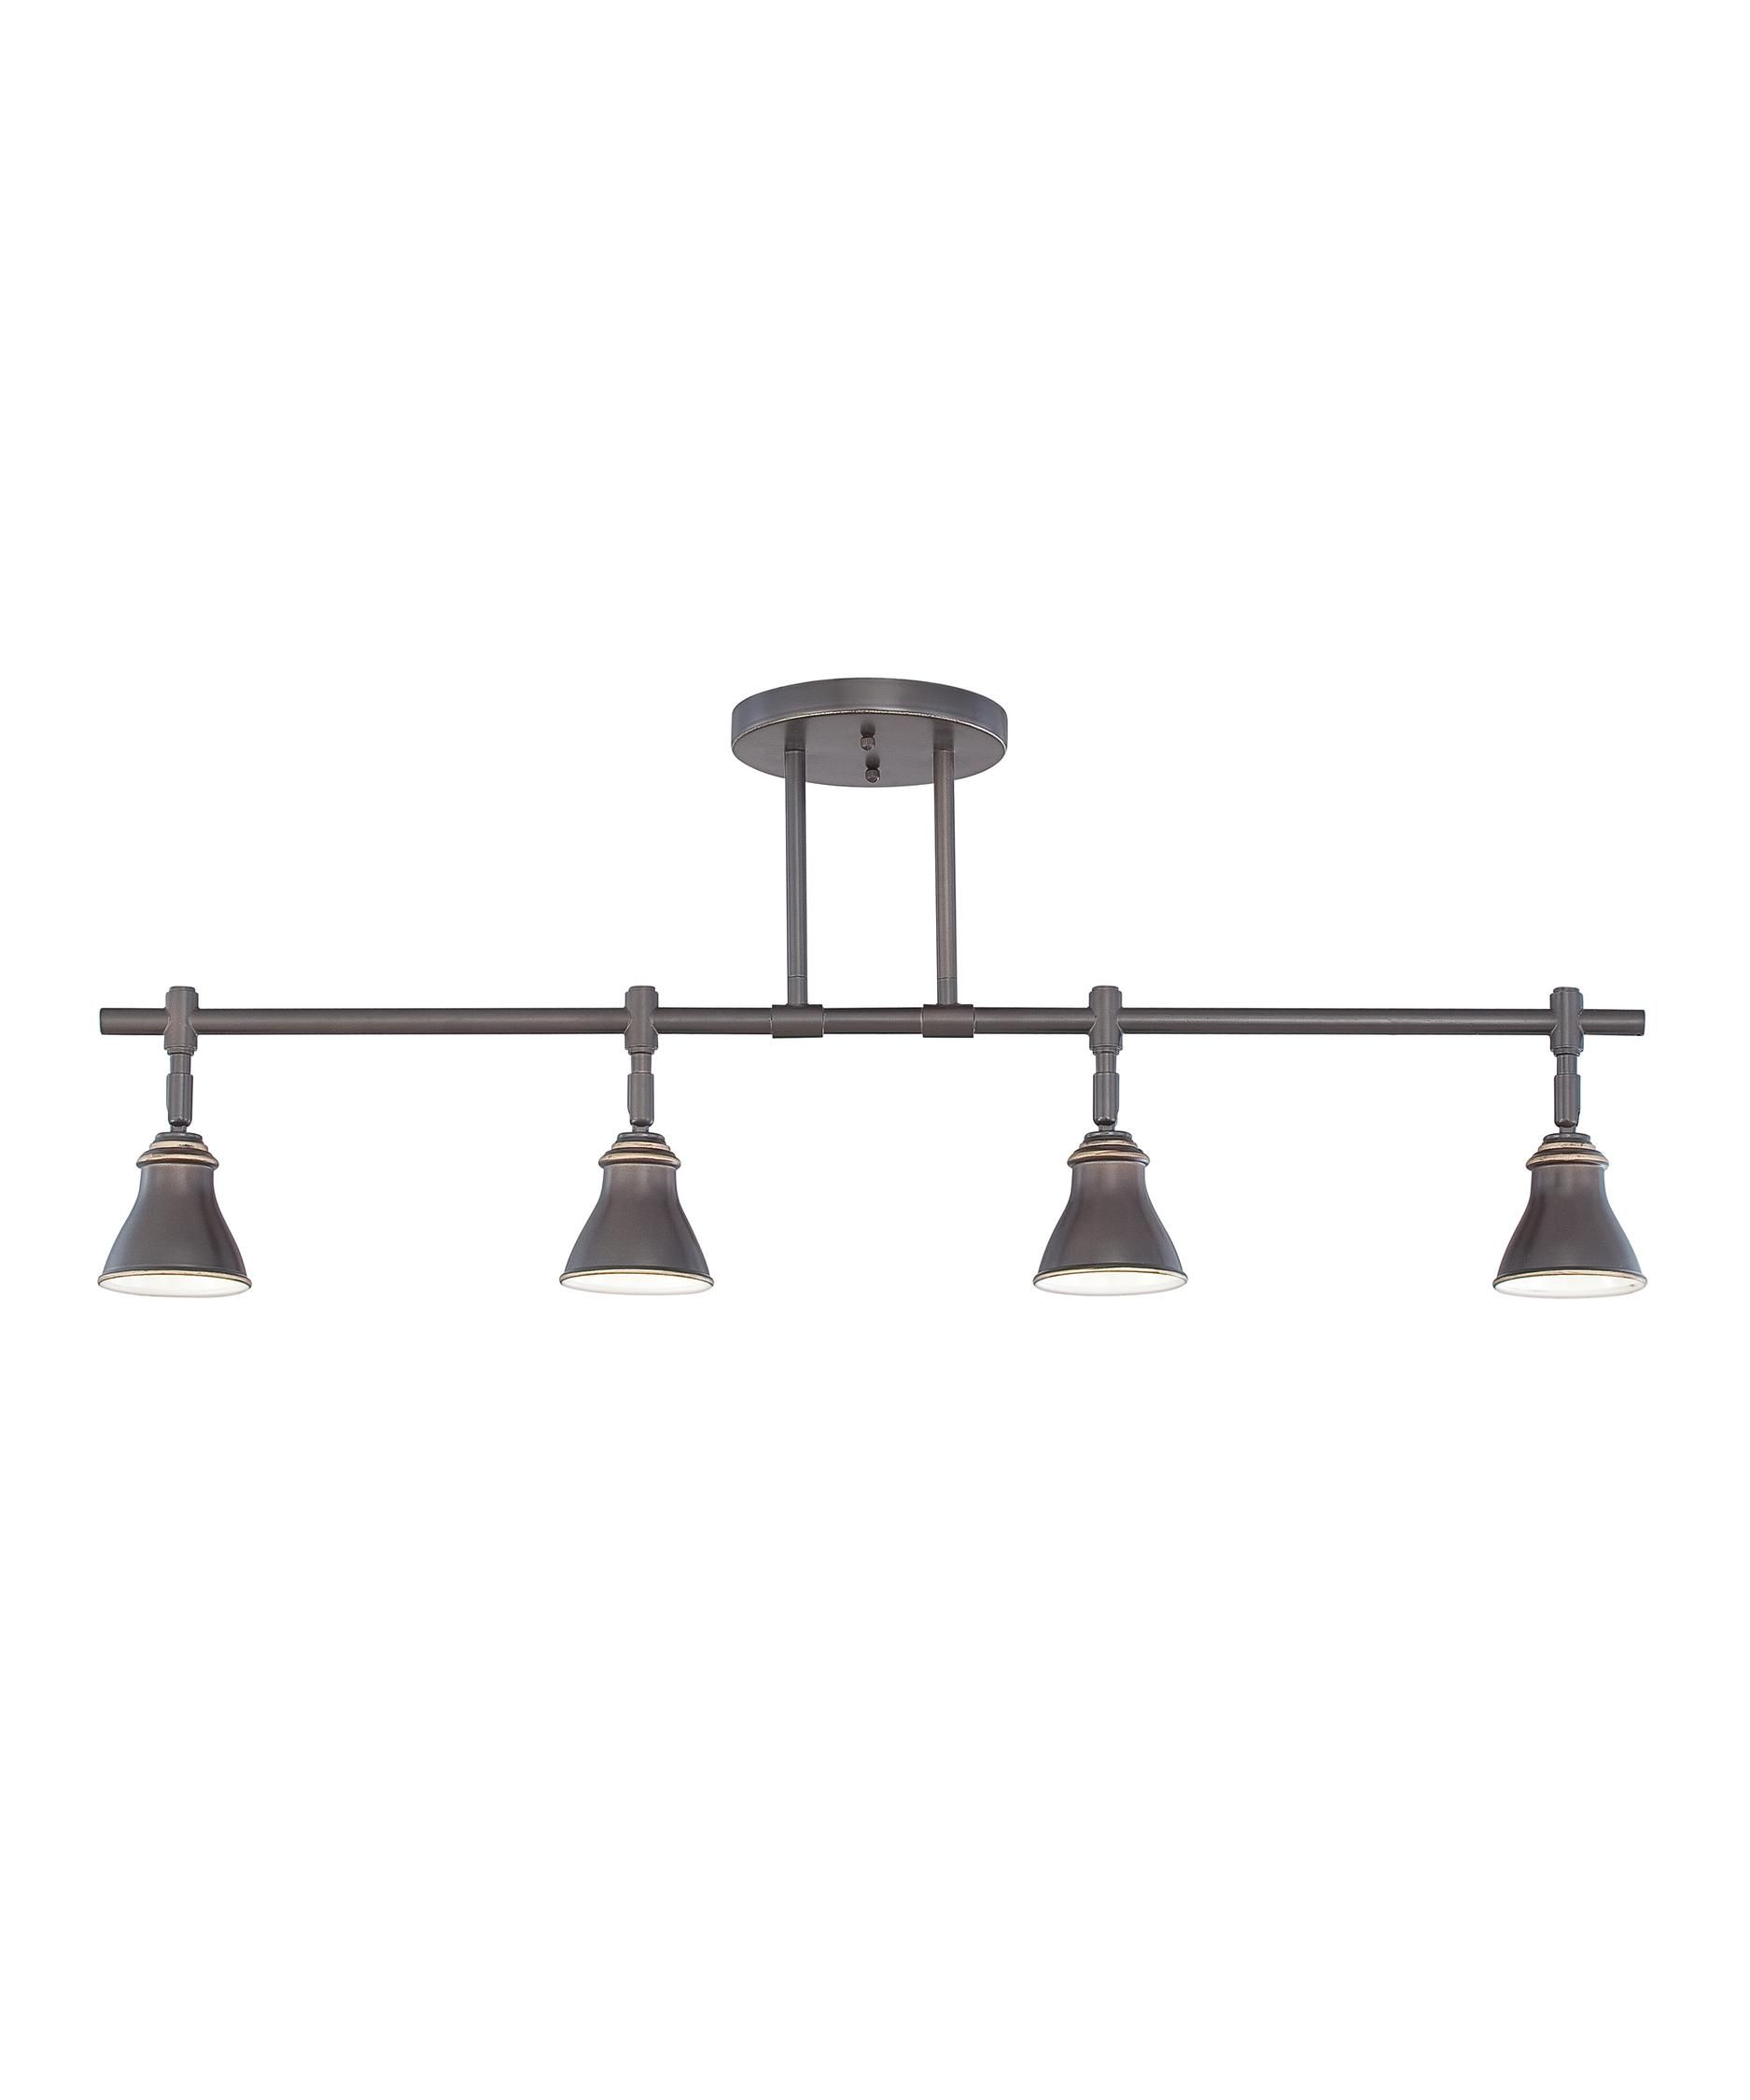 Quoizel Qtr10054 36 Inch Rail Lighting Kit